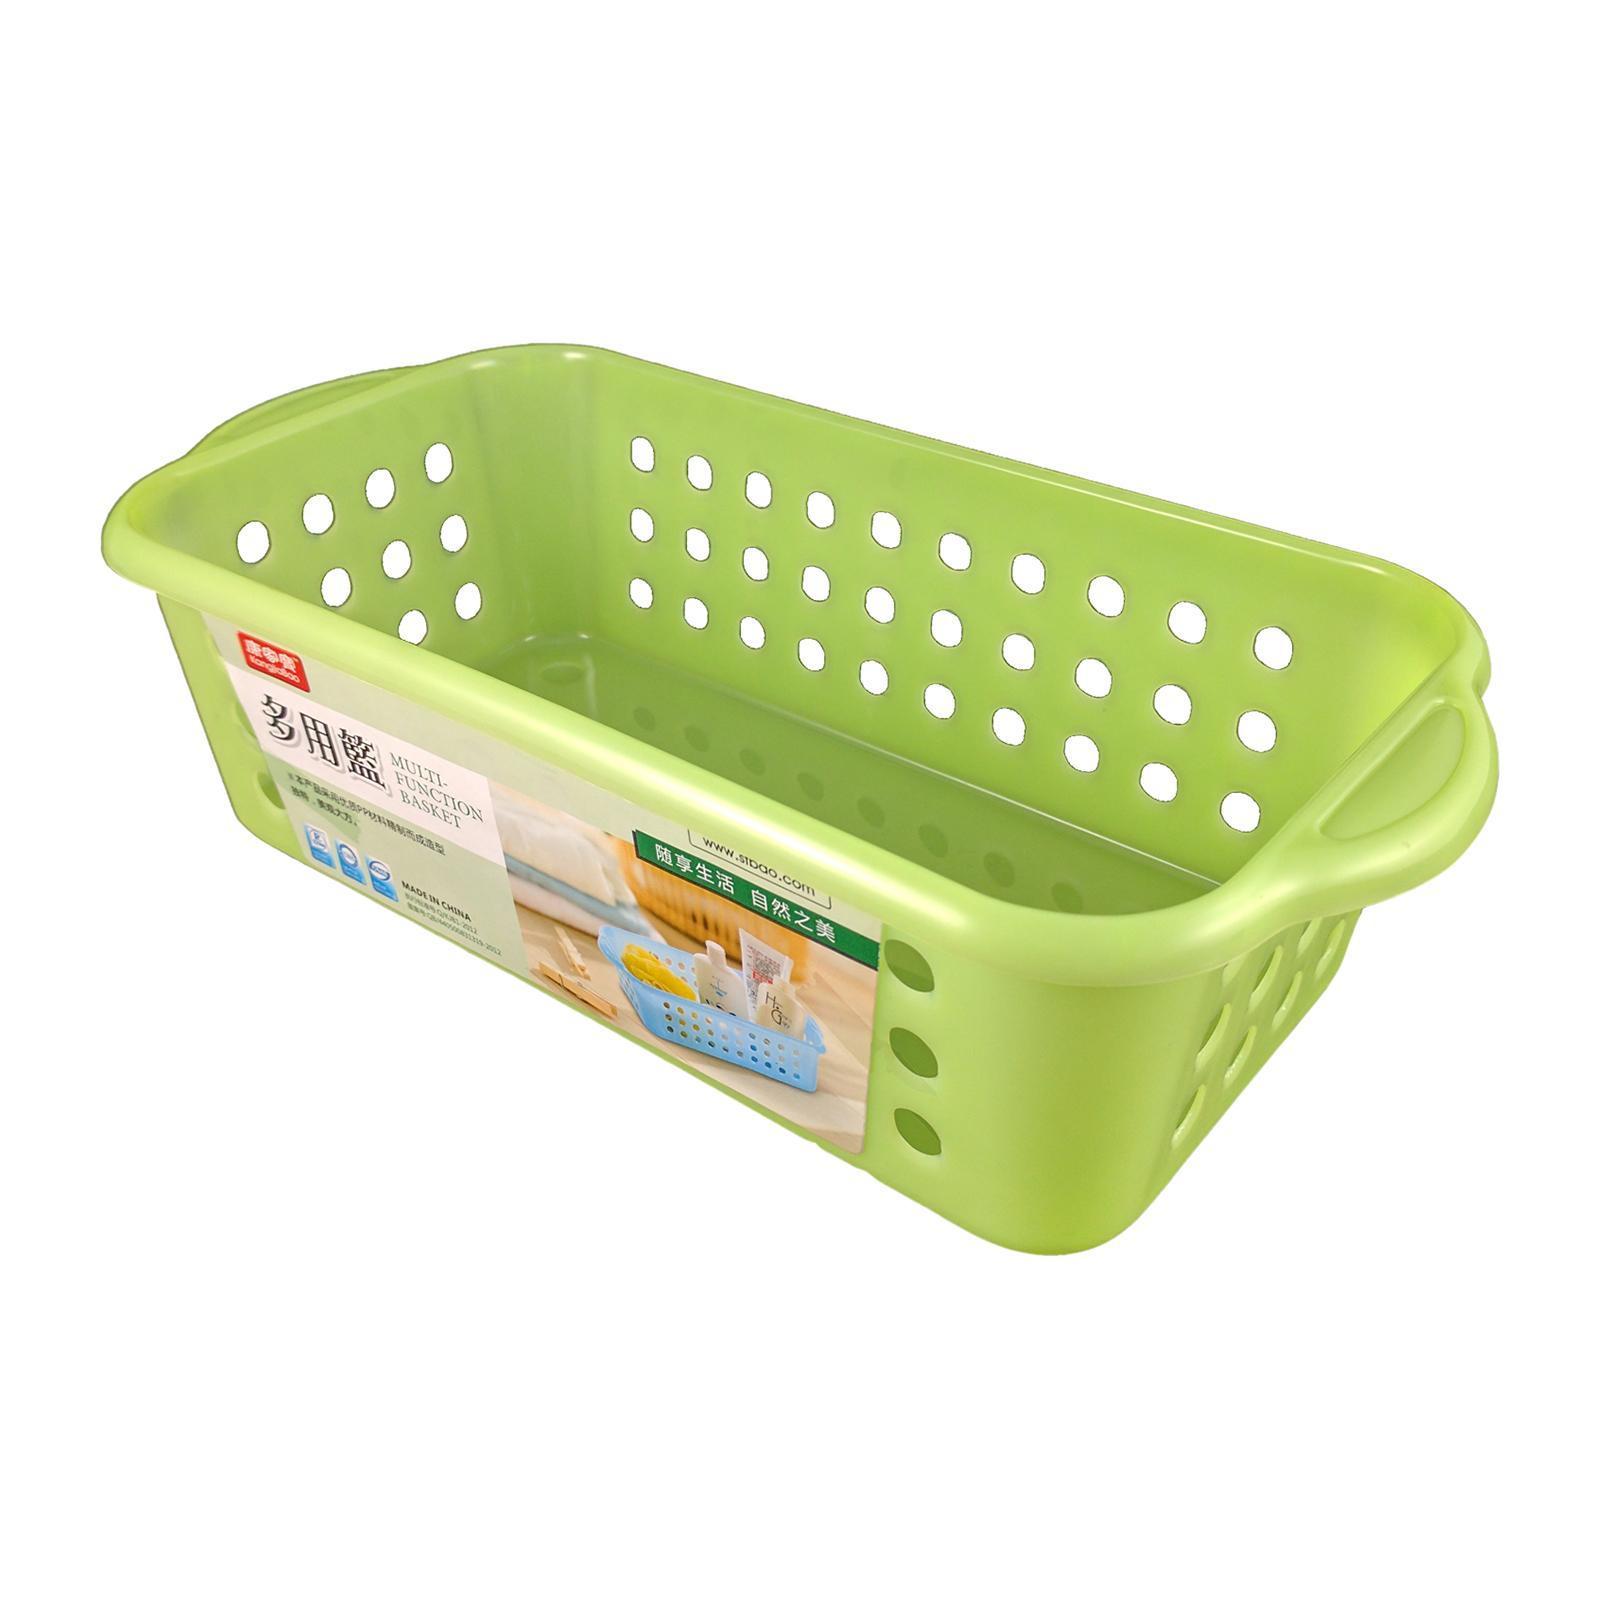 KangjiaBao Plastic Organiser Tray (2 per Pack) - Green